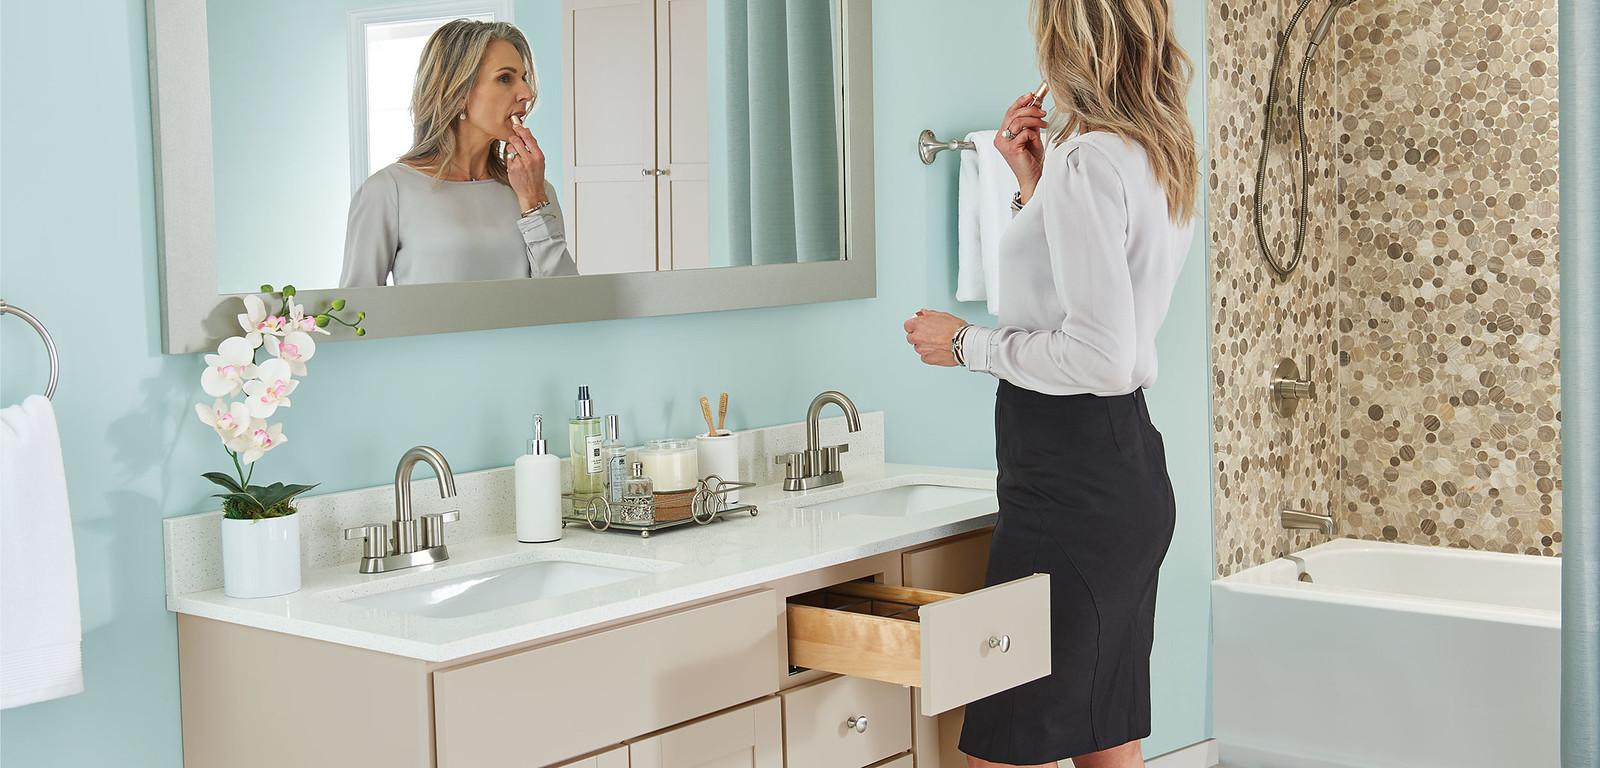 ELLIOT Wolf Signature Cabinetry | Kitchen Bathroom Cabinets Brands ...